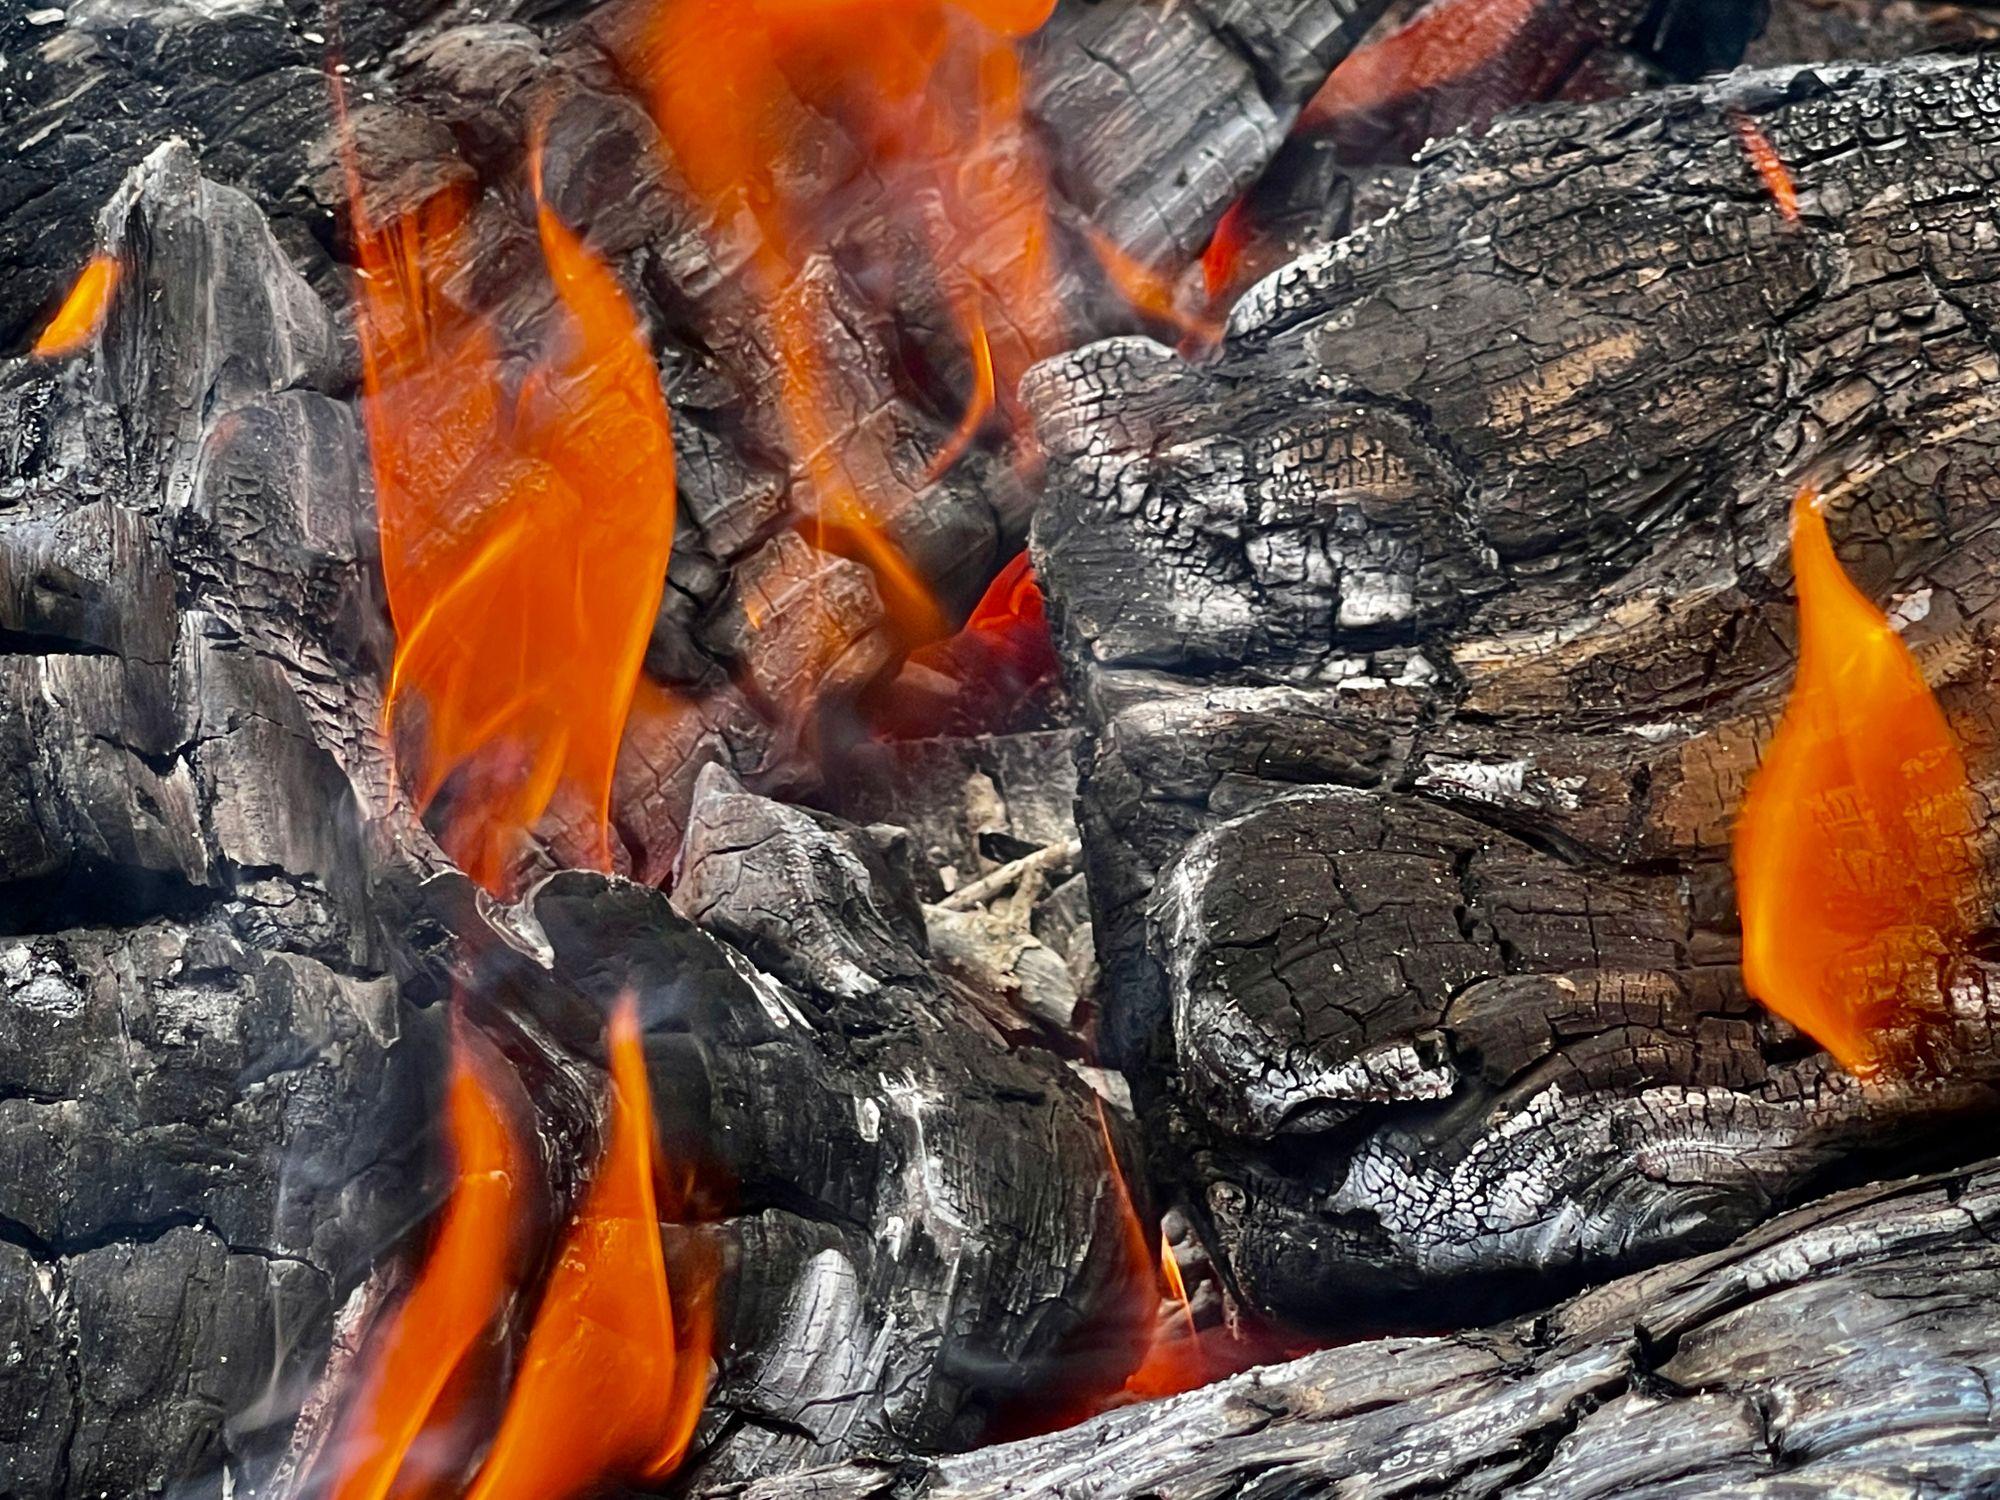 Charred logs burning